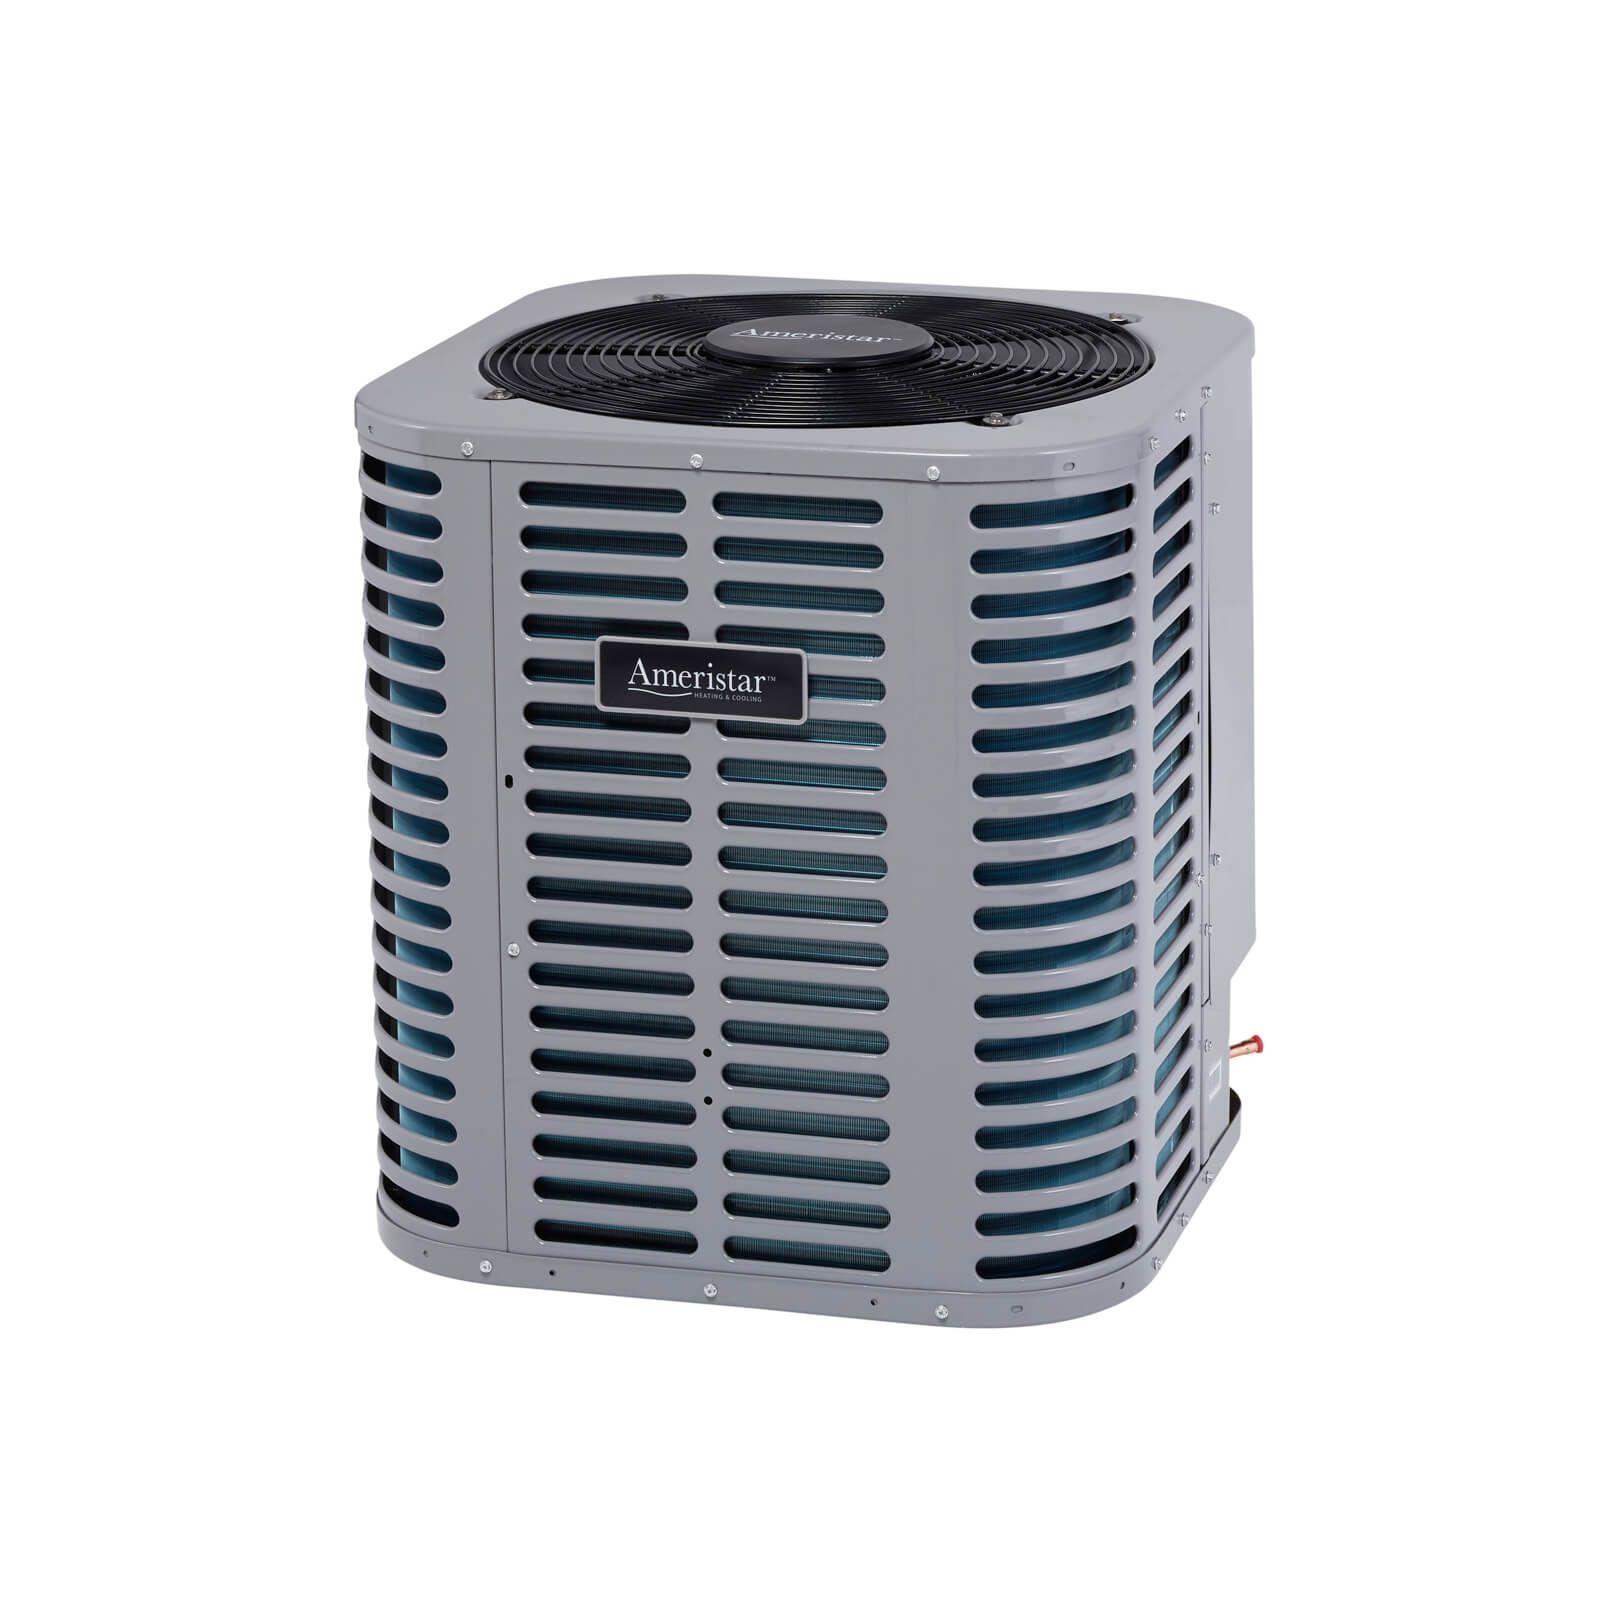 Ameristar™ M4AC6048B1000A - Air Conditioner, 4 Ton, 16 SEER